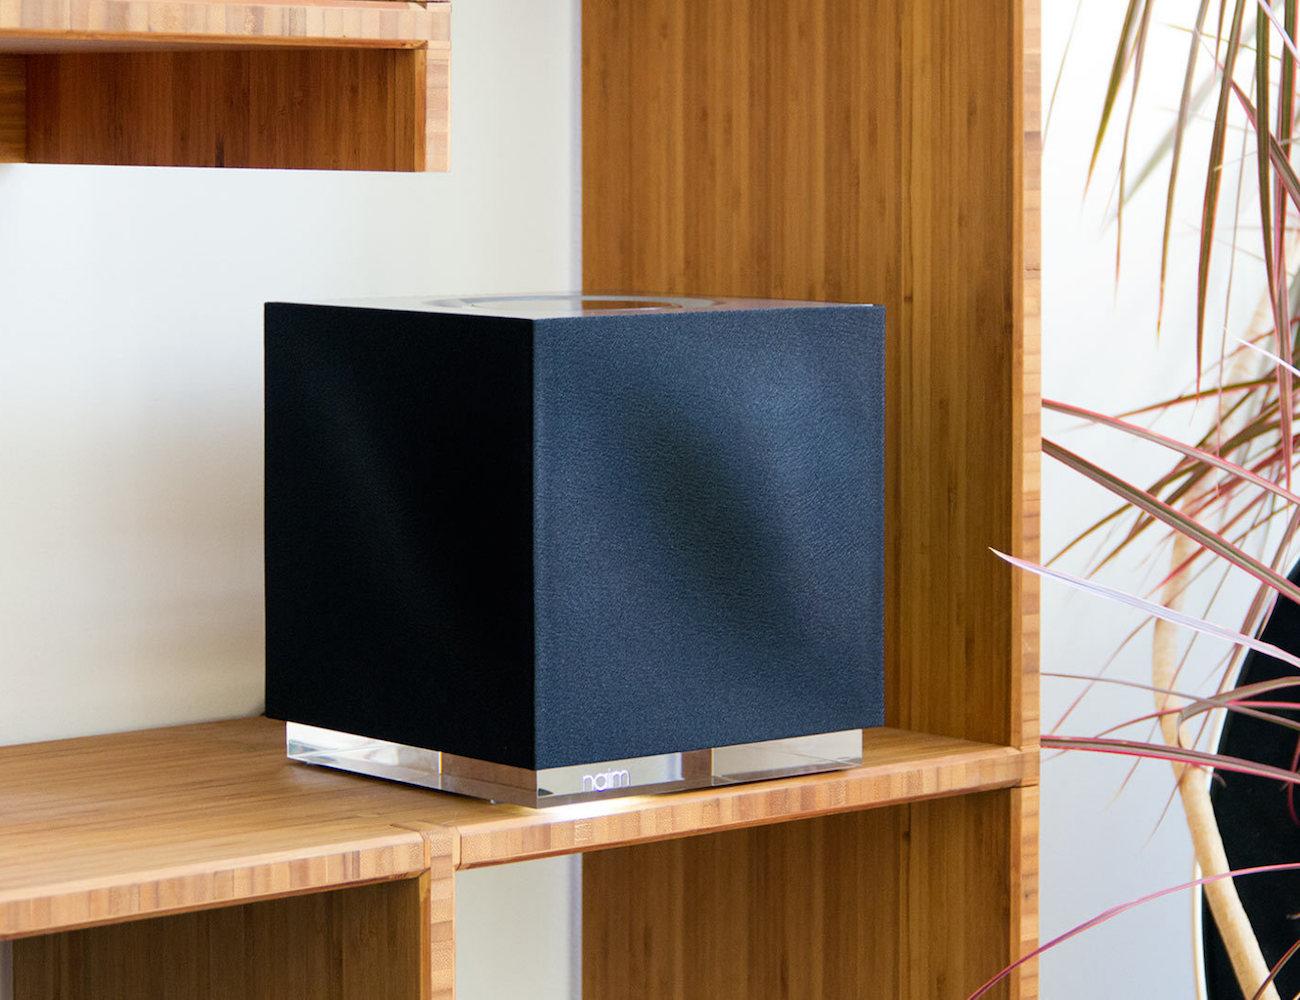 Mu-so+Qb+Wireless+Music+System+By+Naim+Audio